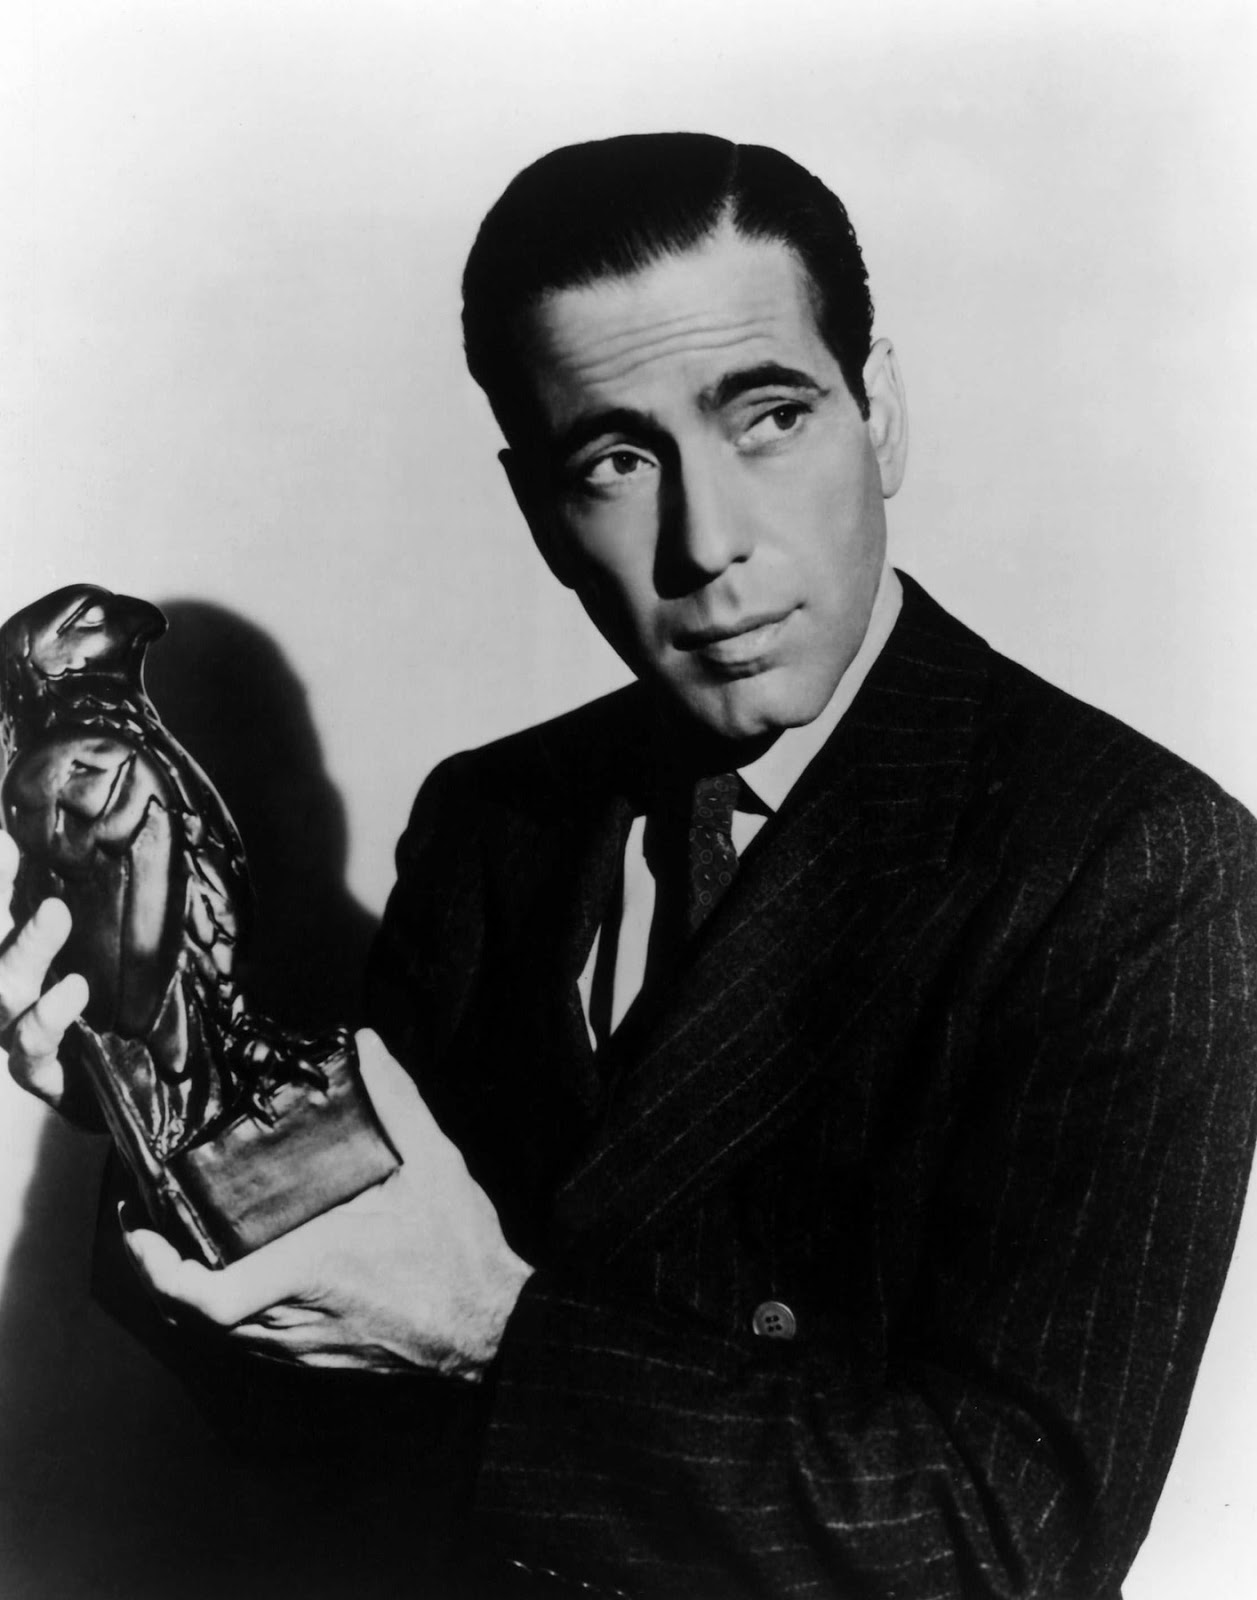 http://3.bp.blogspot.com/-cTUr3MB8kO0/USU_3i8C74I/AAAAAAAAPBU/HT1Gnxt4iFI/s1600/Annex-Bogart-Humphrey-Maltese-Falcon-The_01.jpg